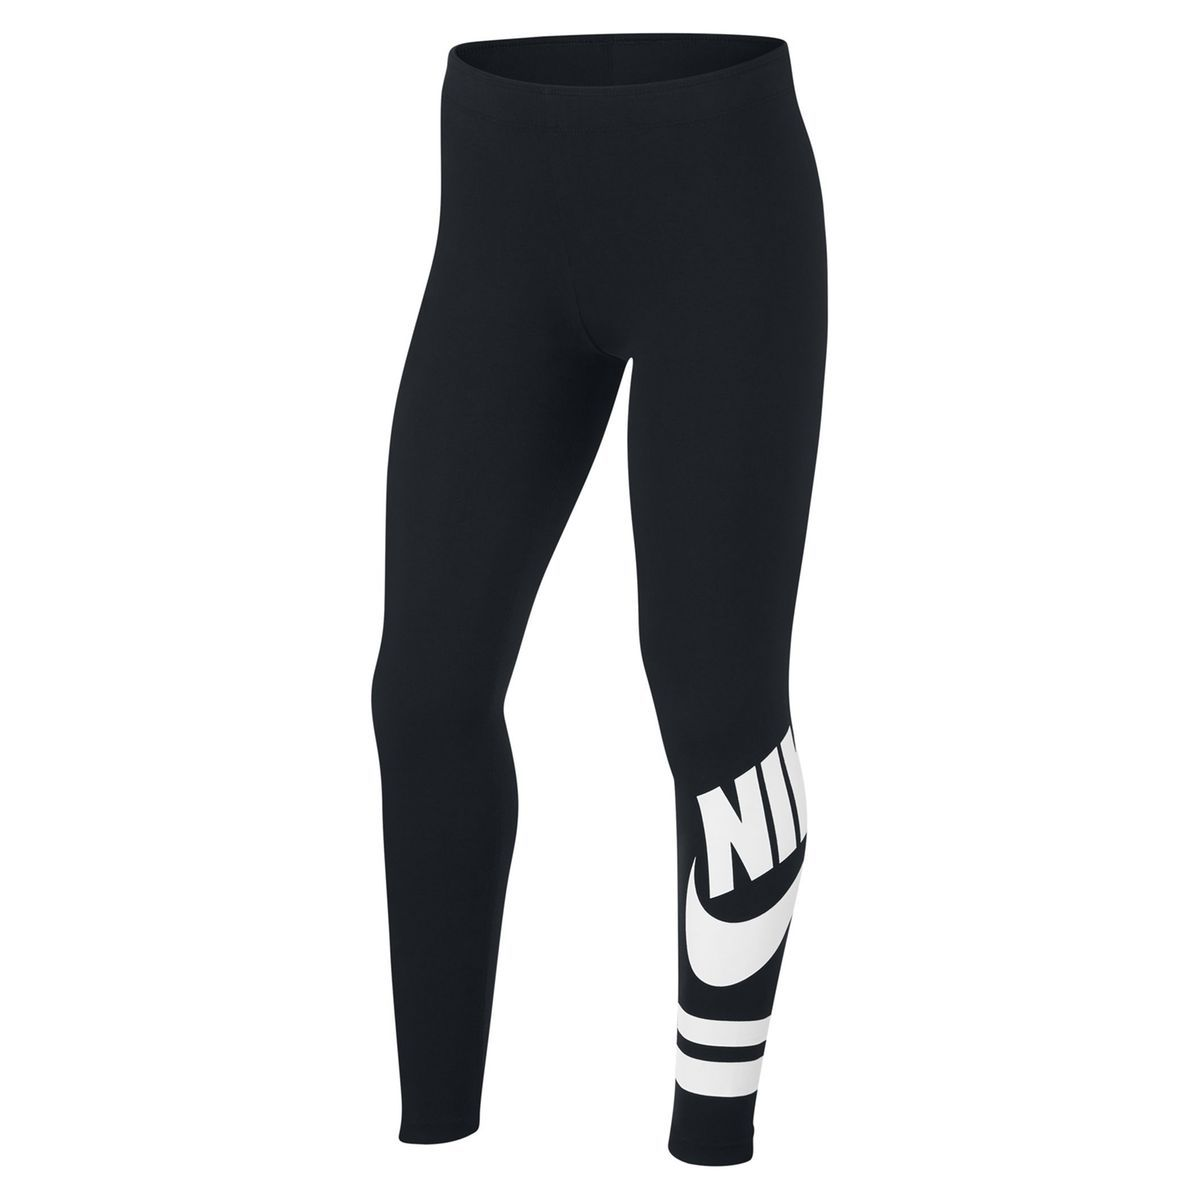 Pantalons Fitness et Musculation Nike Leg a See Logo Legging